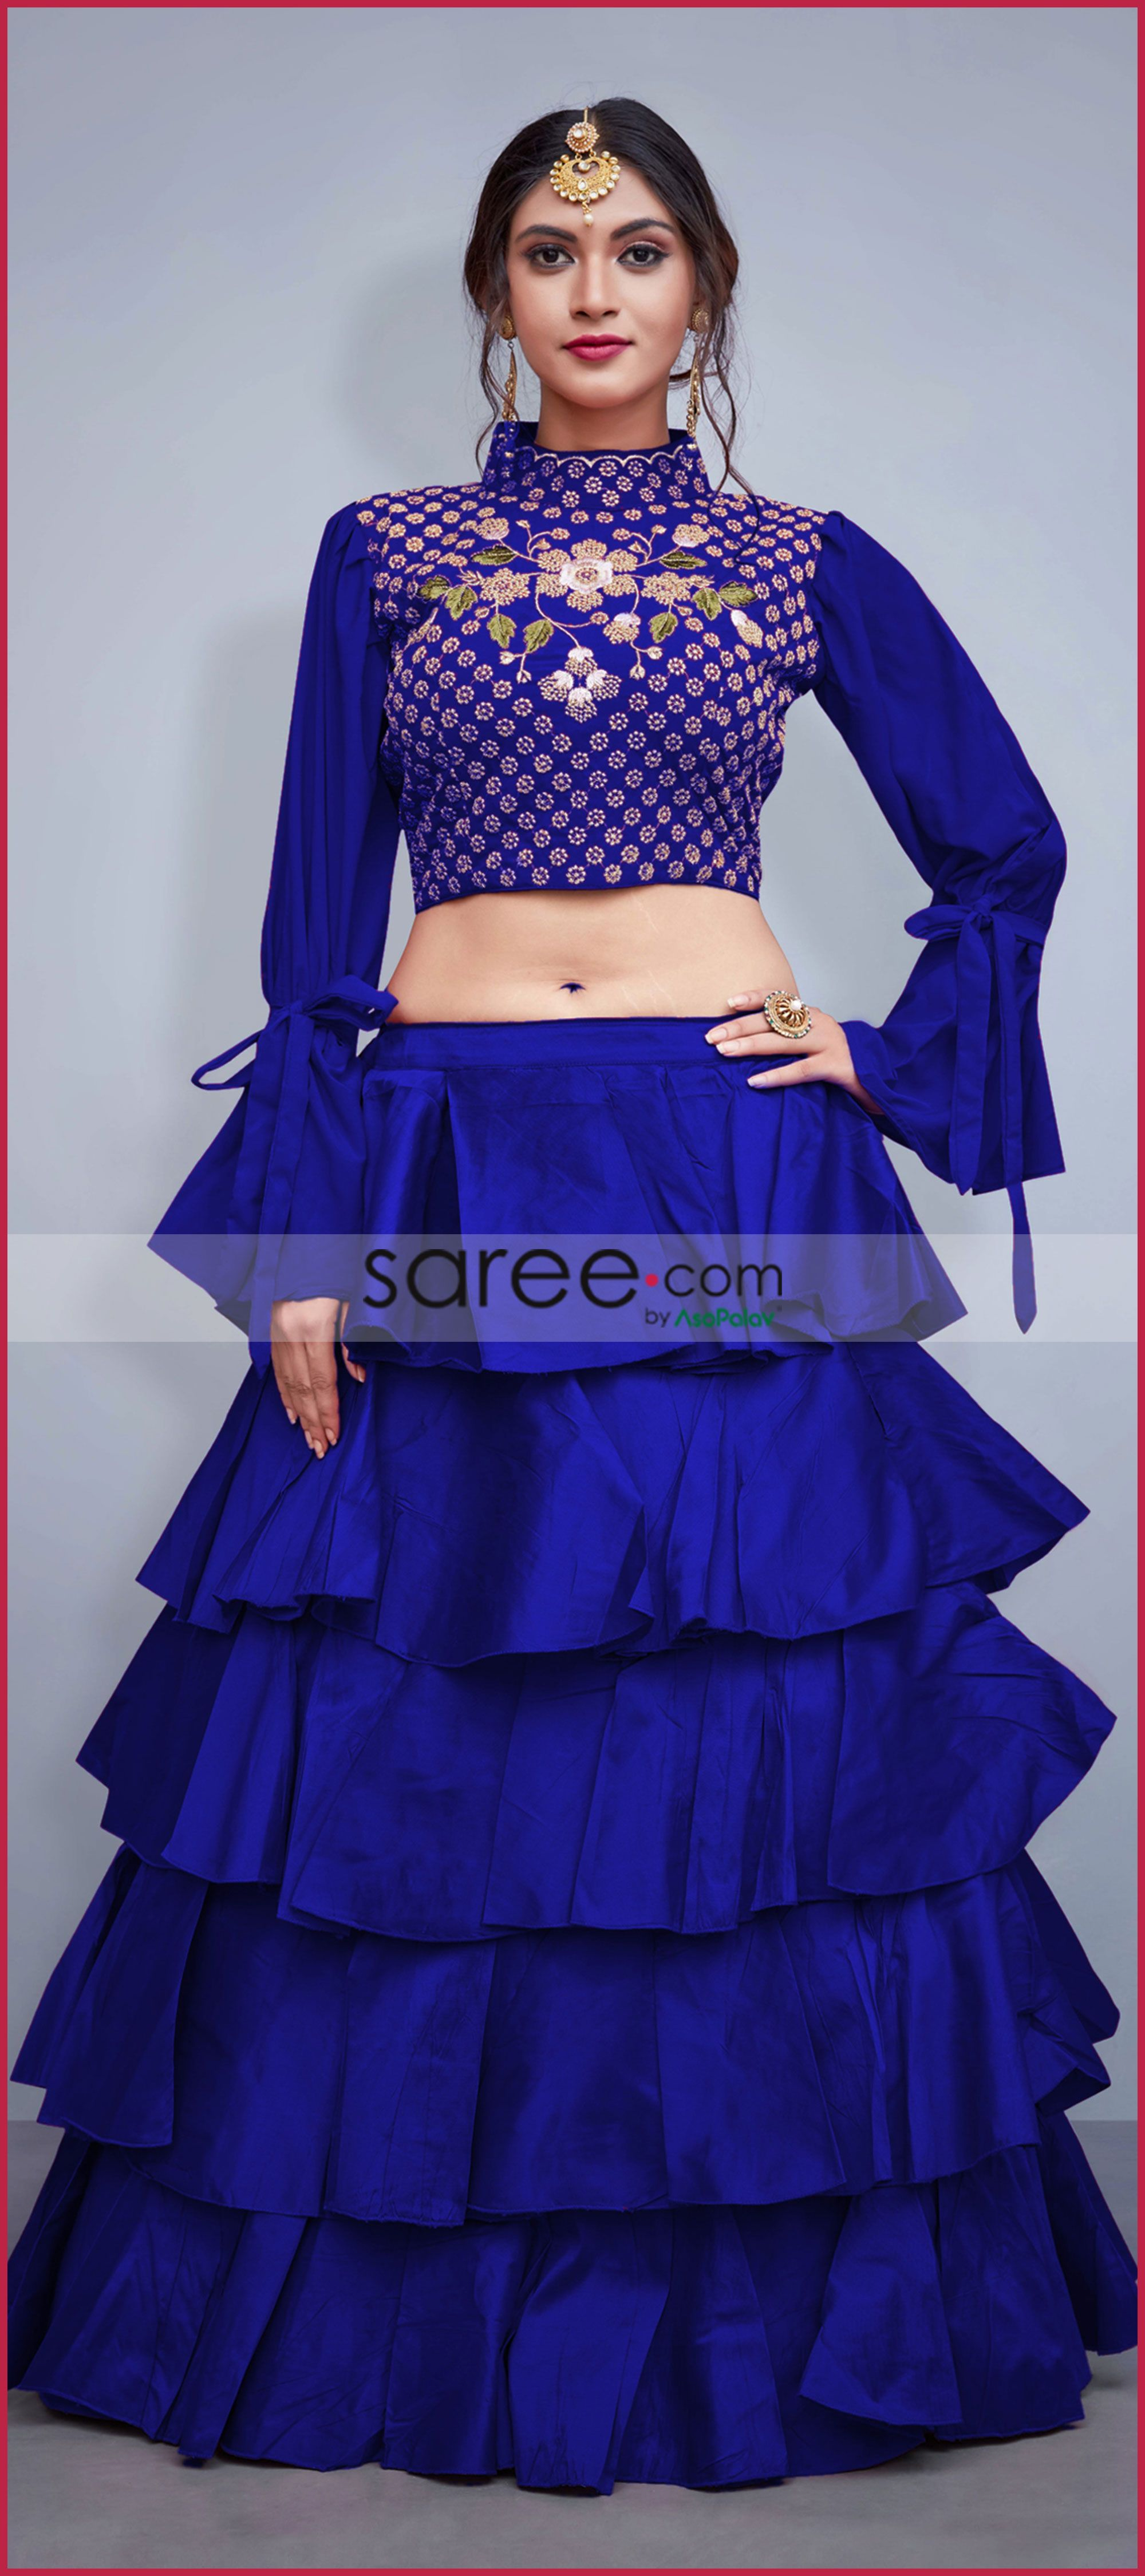 d2cbd6f4ac31de Blue Art Silk Frilled Lehenga Choli | Anarkali/lehanga/ghagra ...